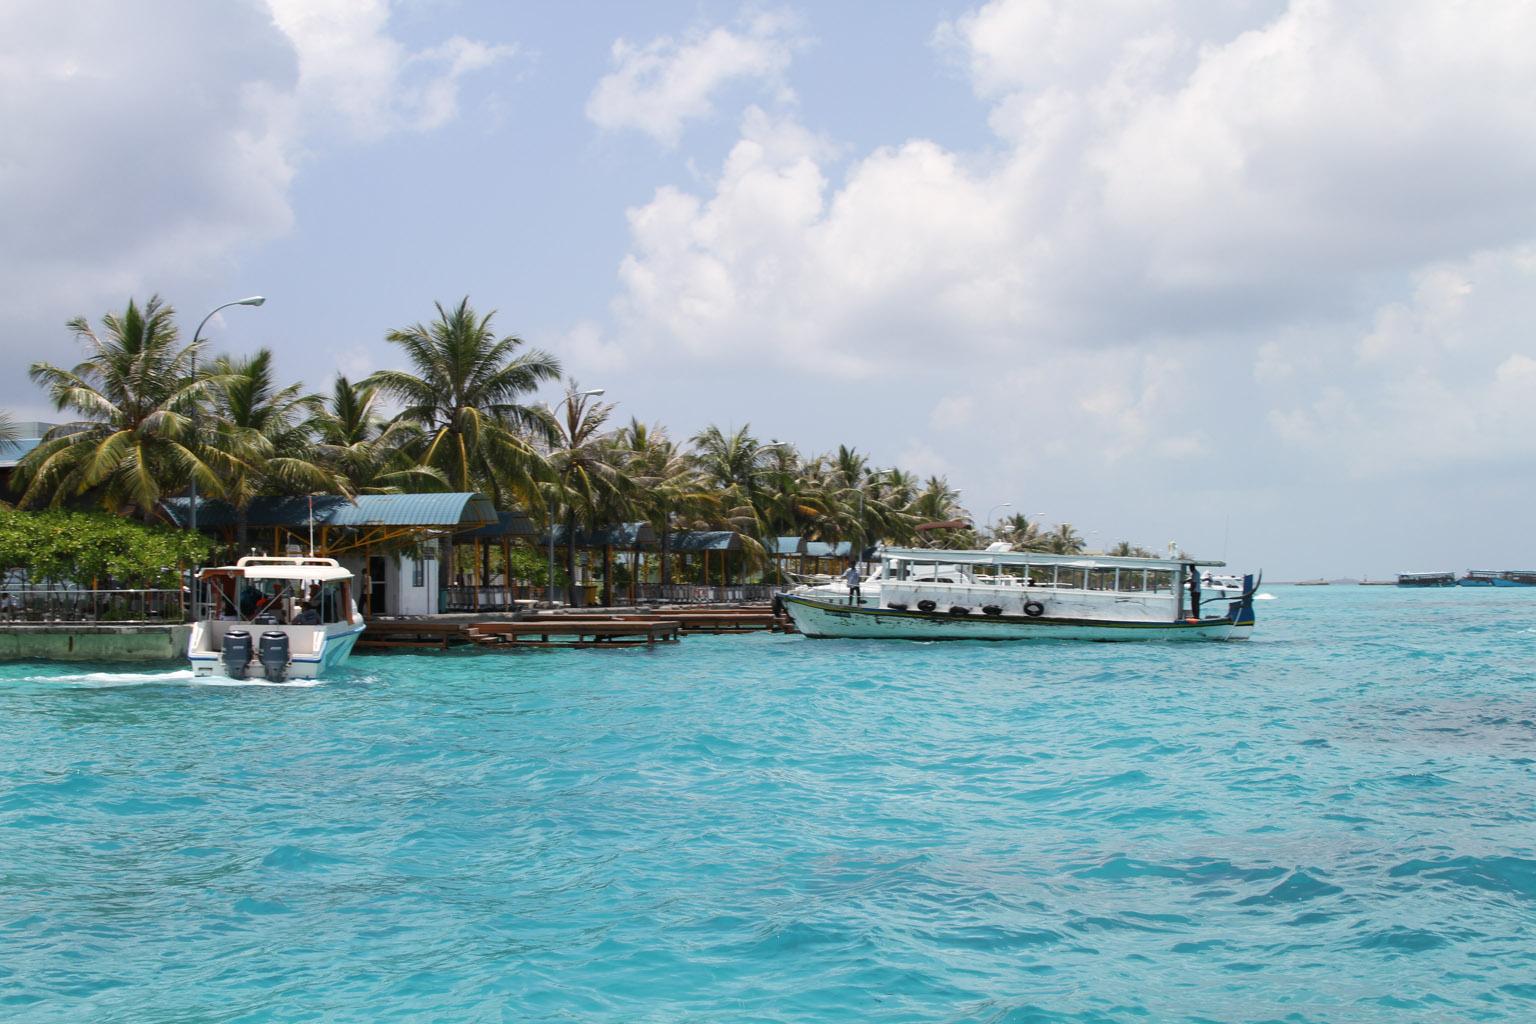 Maldives • April, 2012 • Douglas Stebila - photo#17